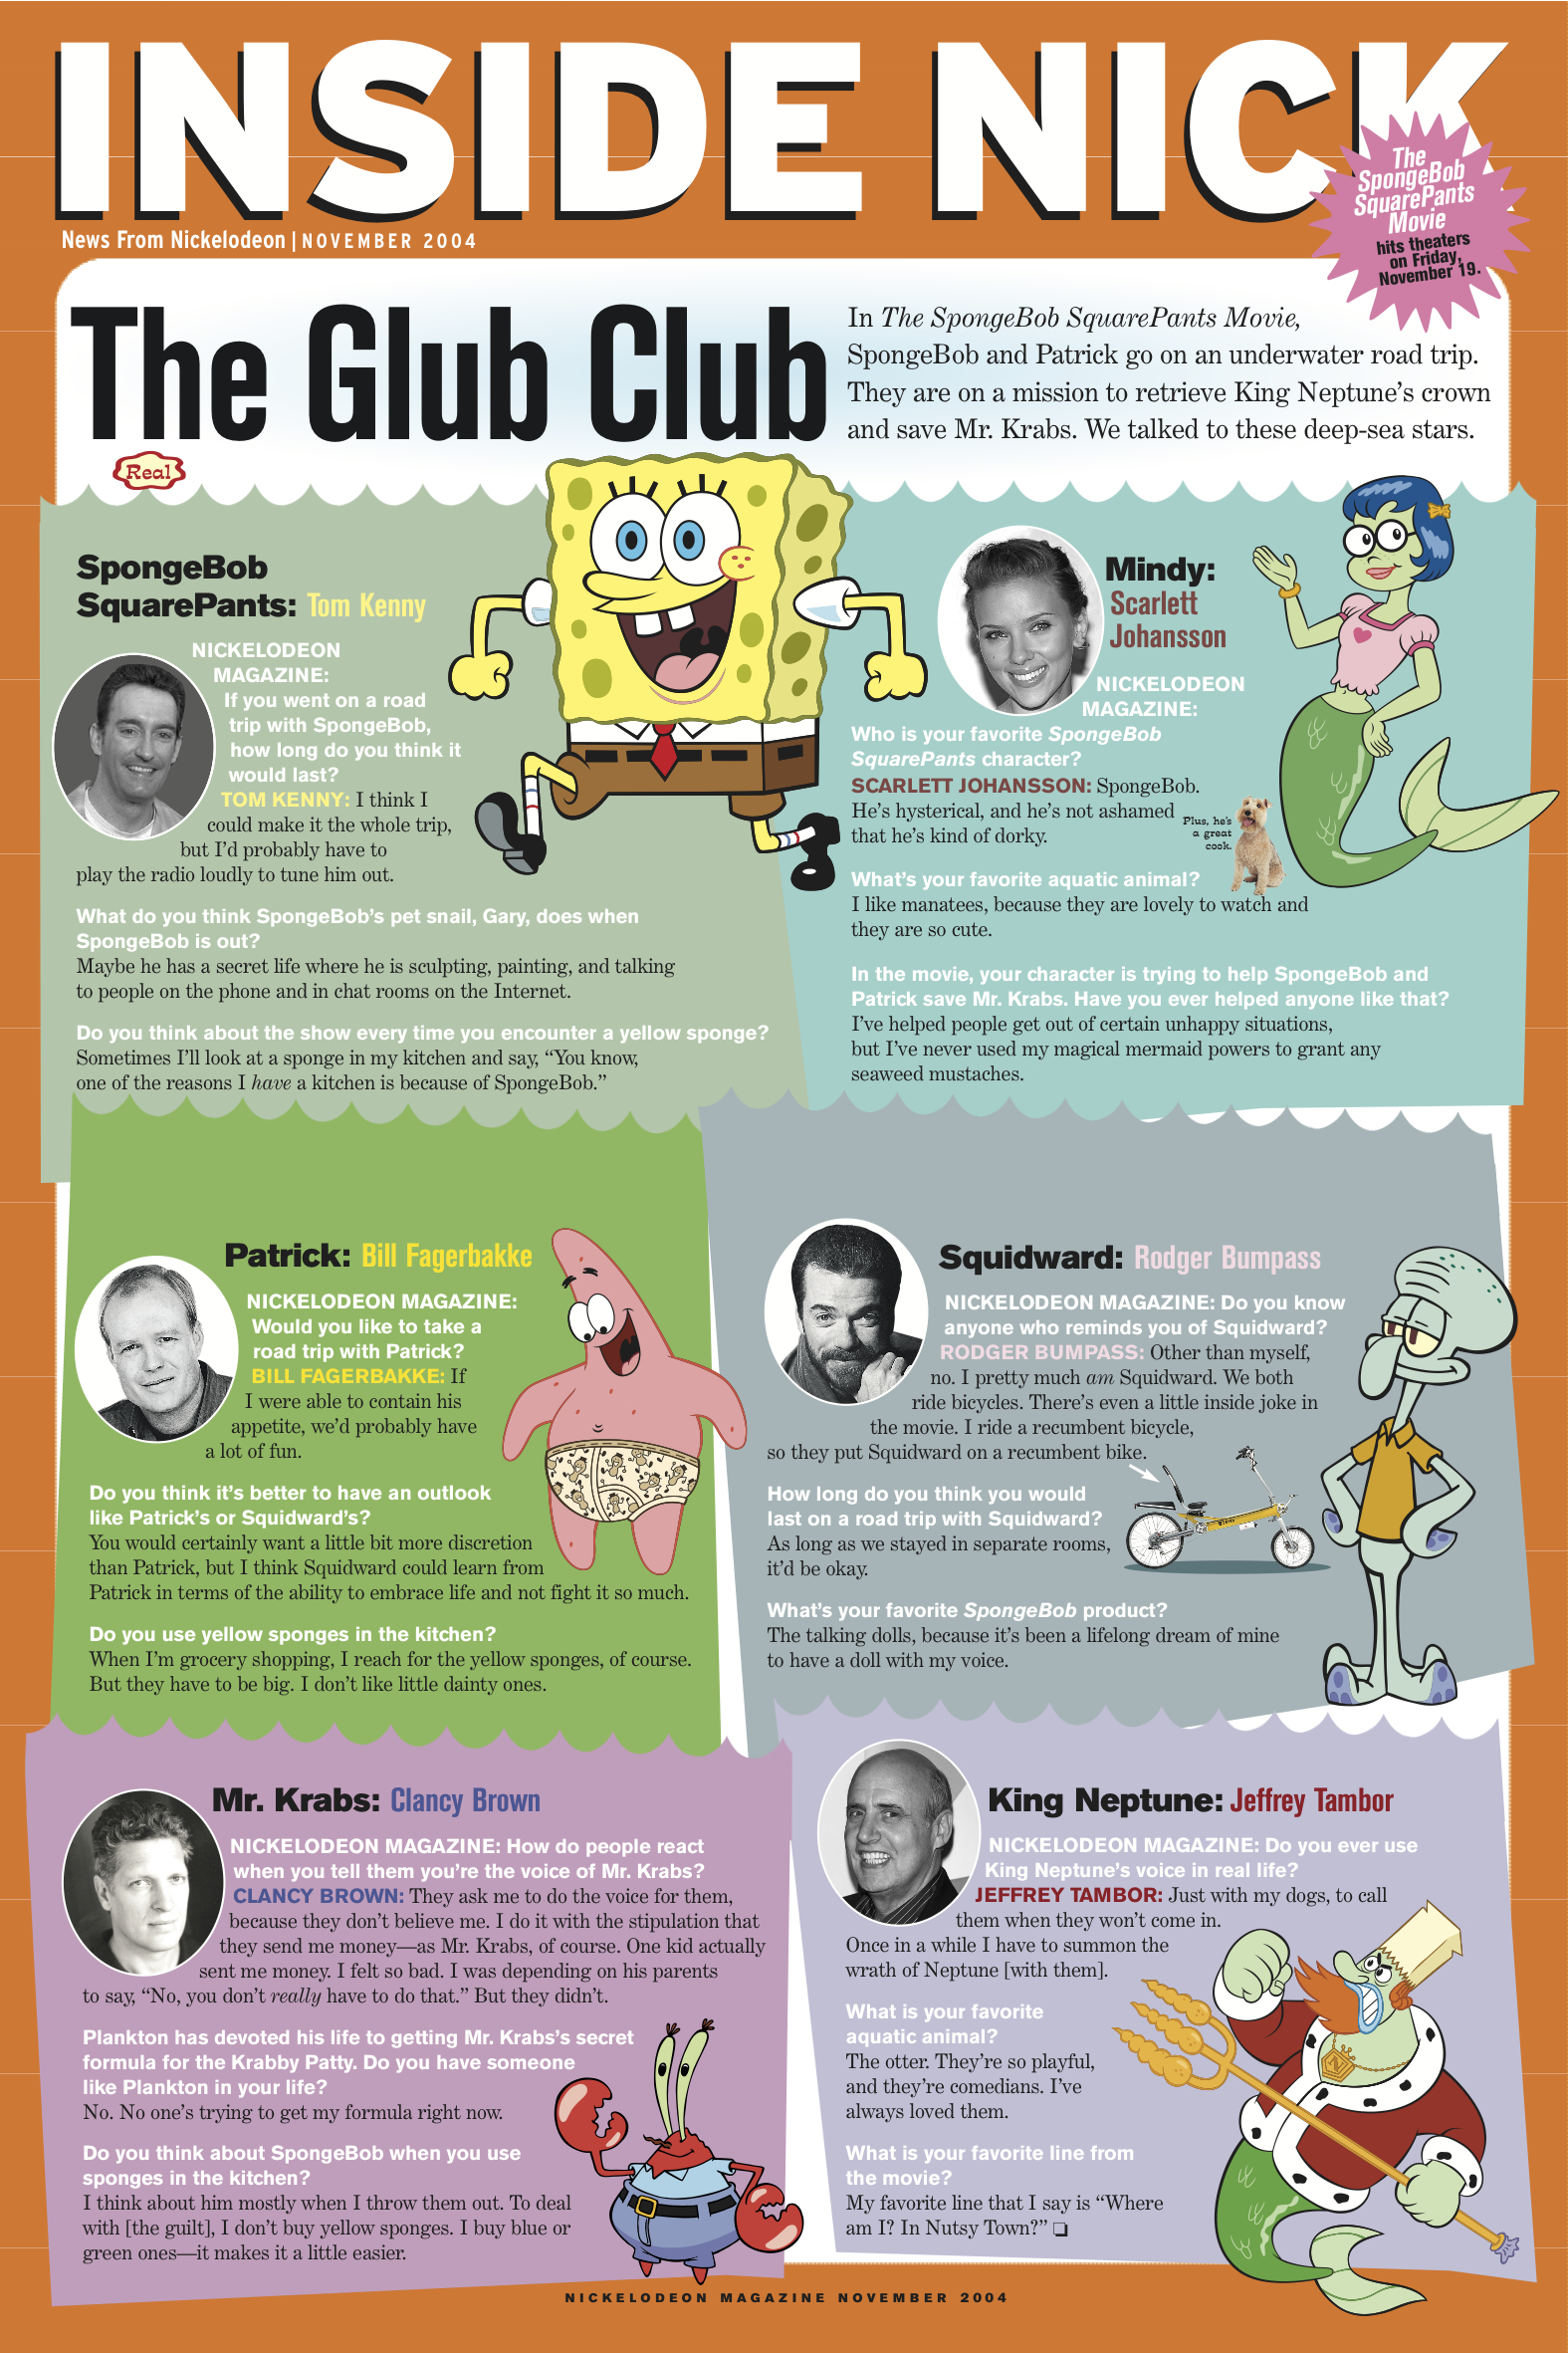 NickelodeonMagazine_SpongeBob Movie Cast.jpg